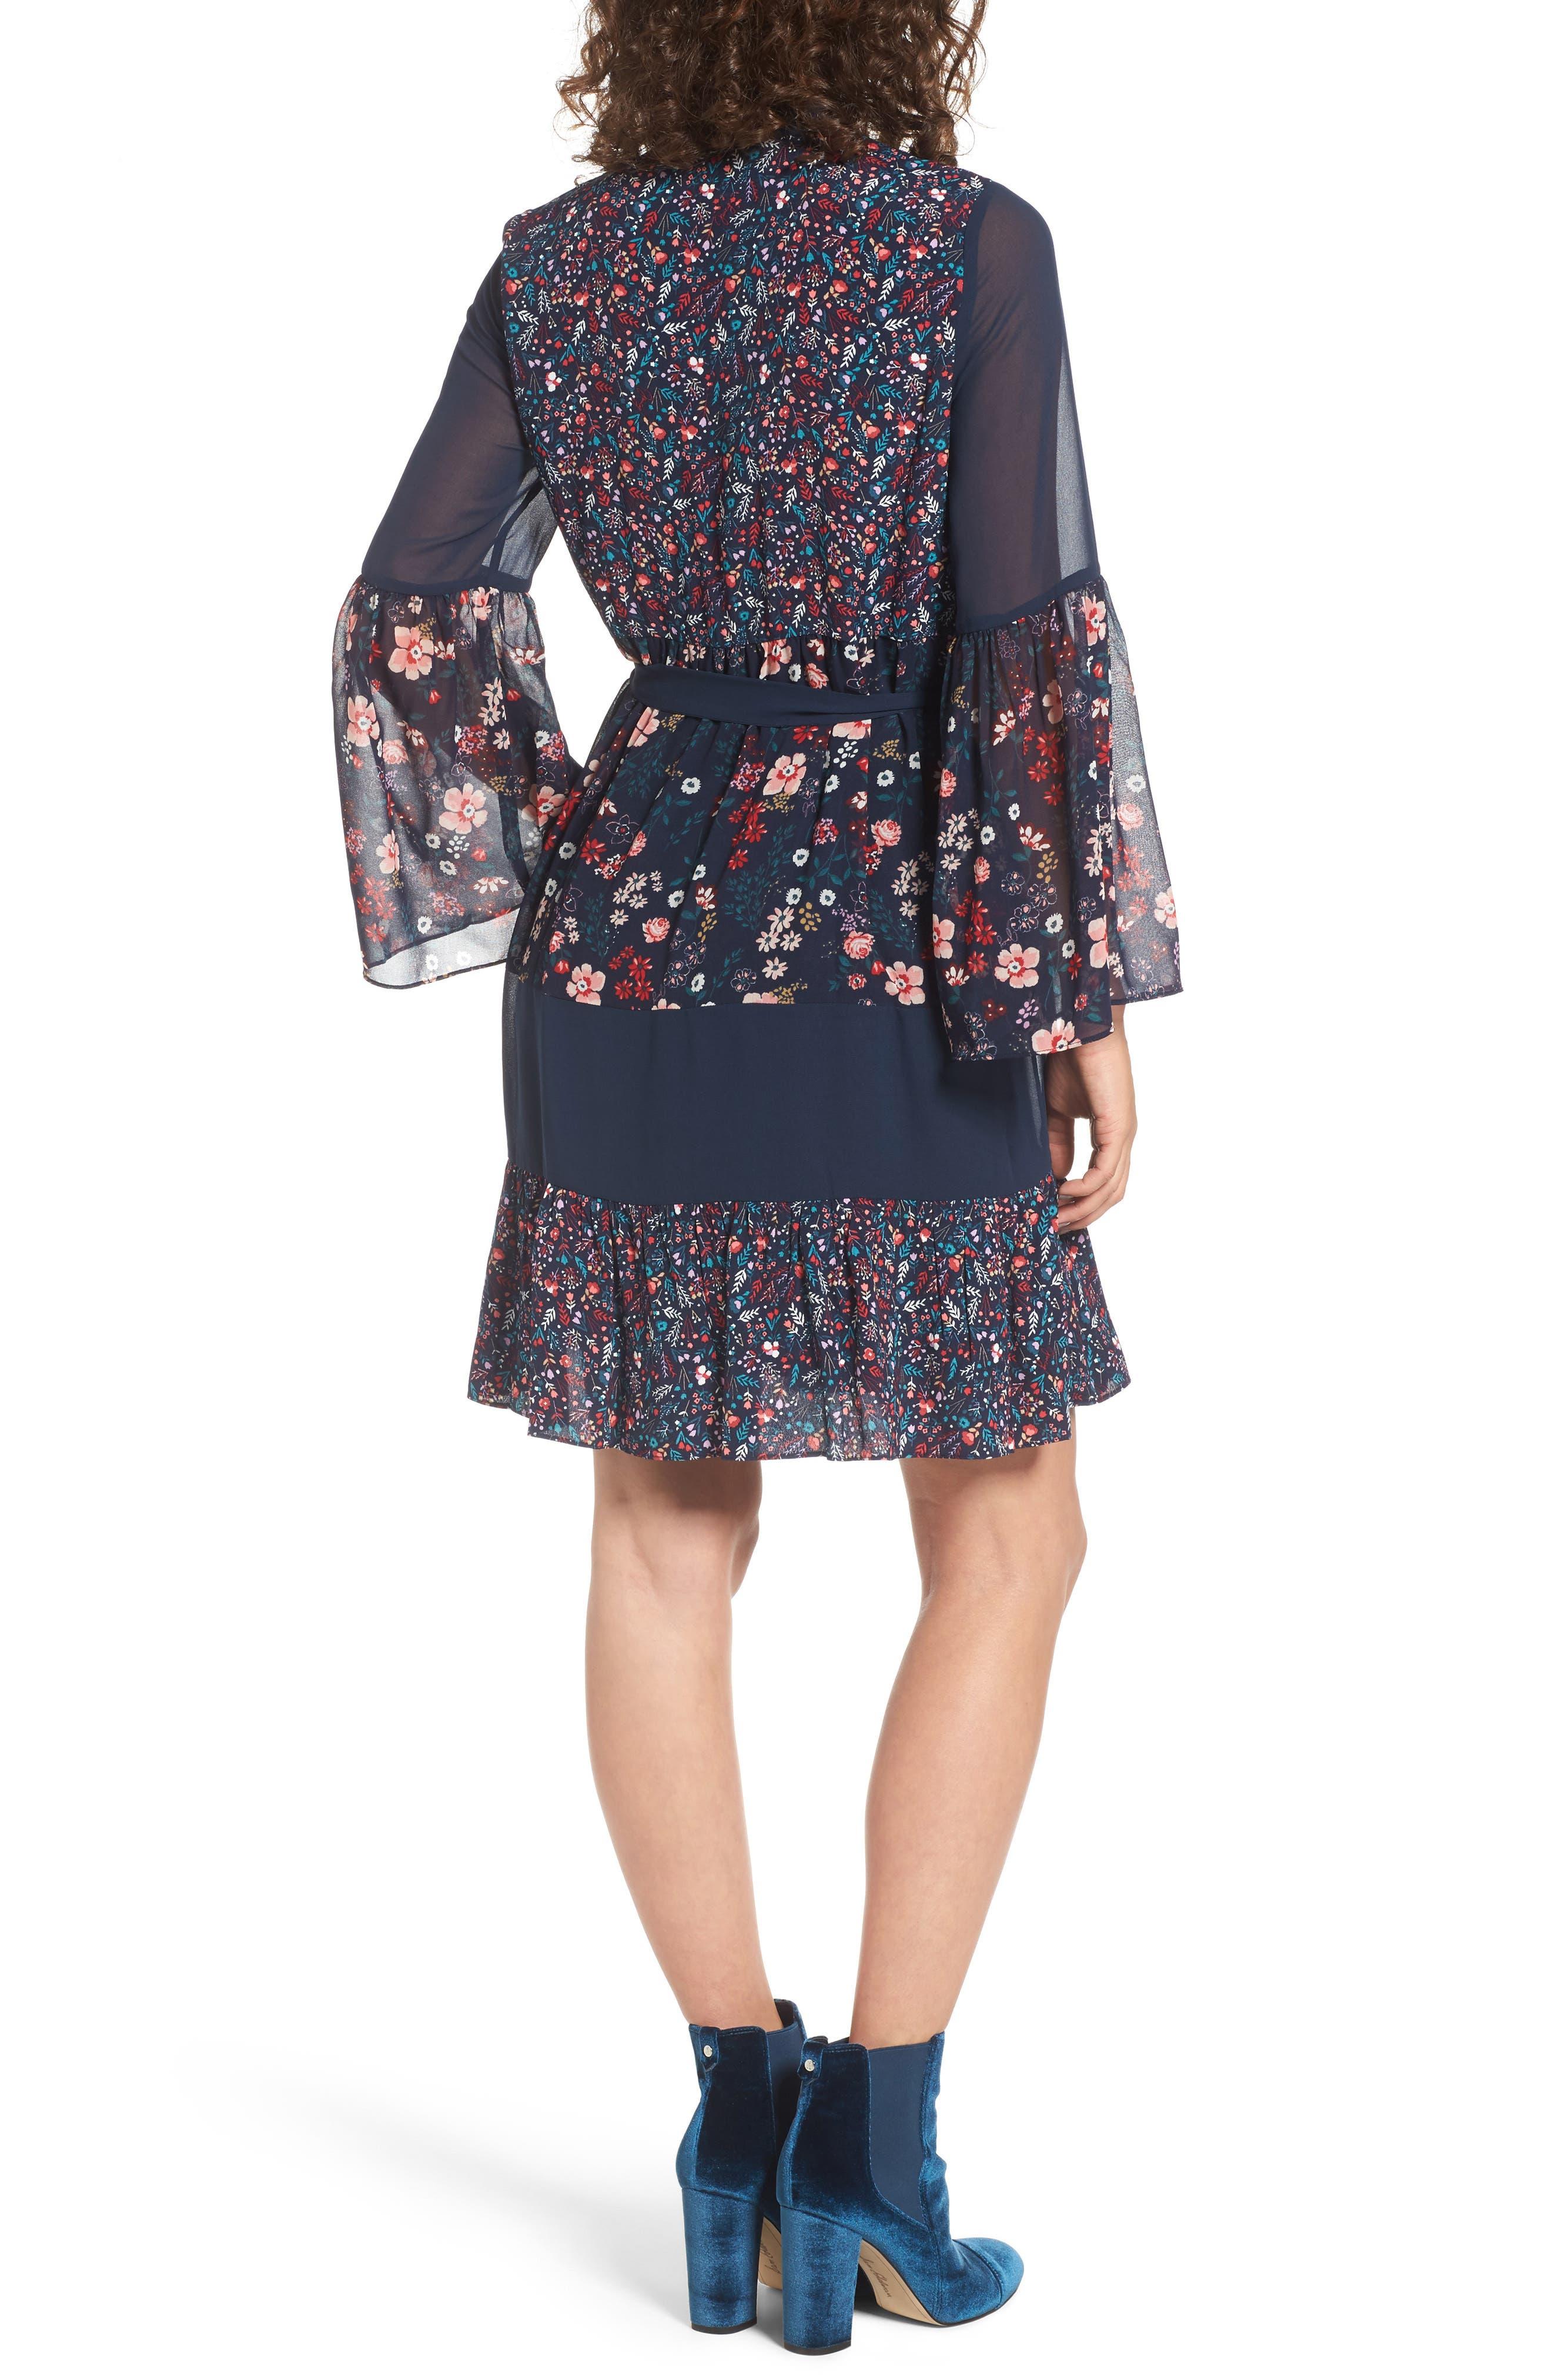 Caprice Floral Mix Shirtdress,                             Alternate thumbnail 2, color,                             Regal Caprice